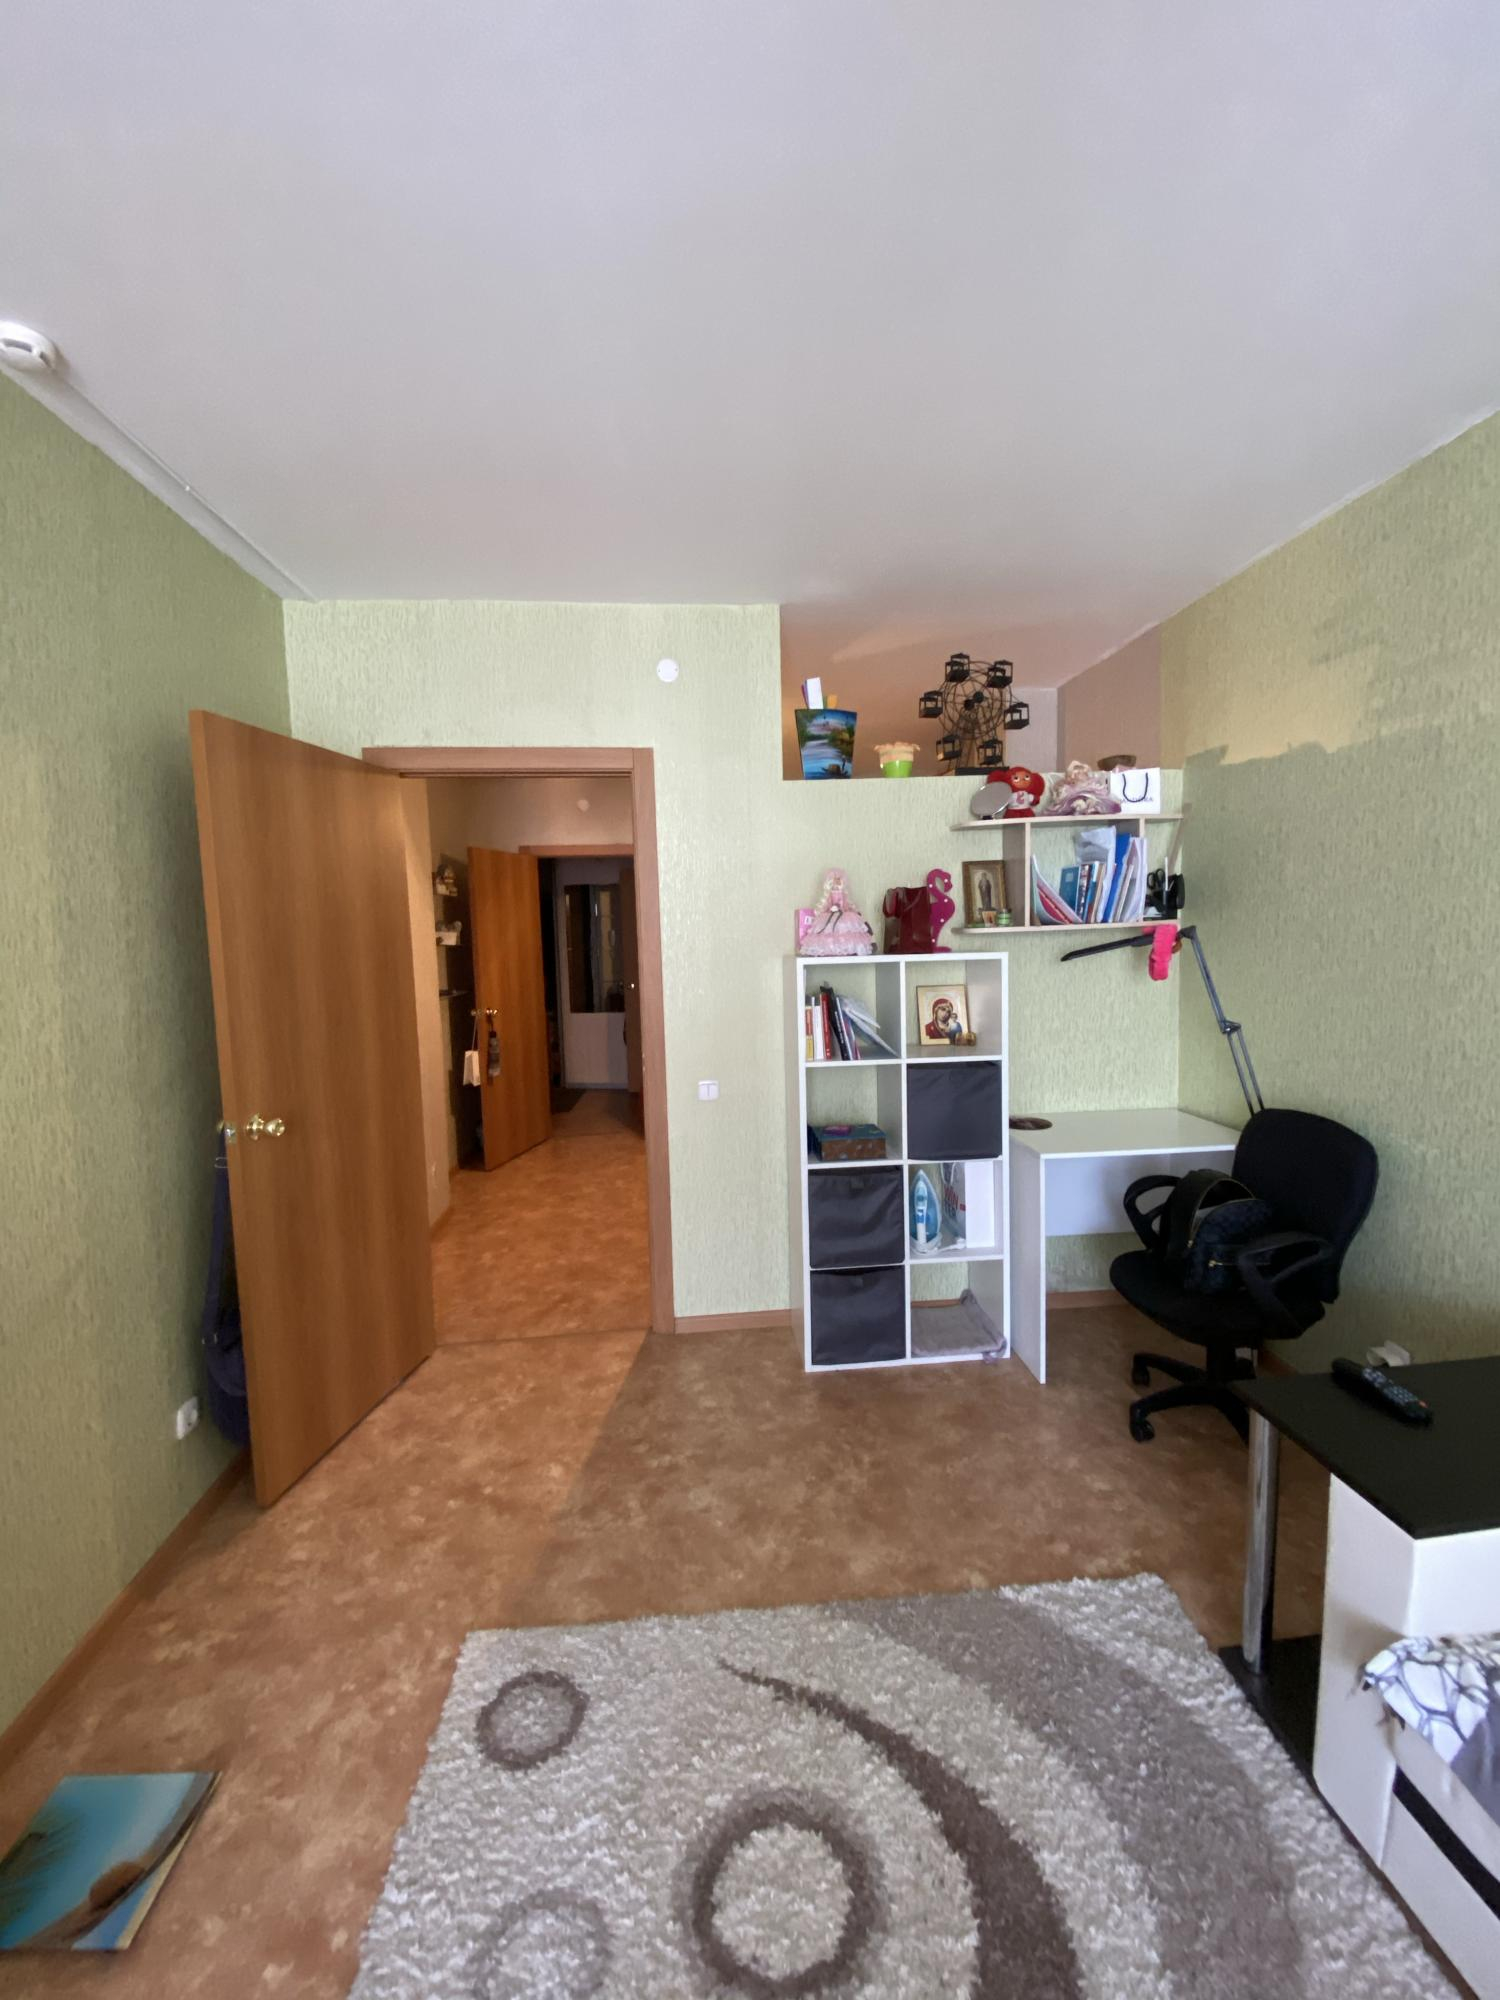 1к квартира Лесопарковая улица, 25 | 15000 | аренда в Красноярске фото 1